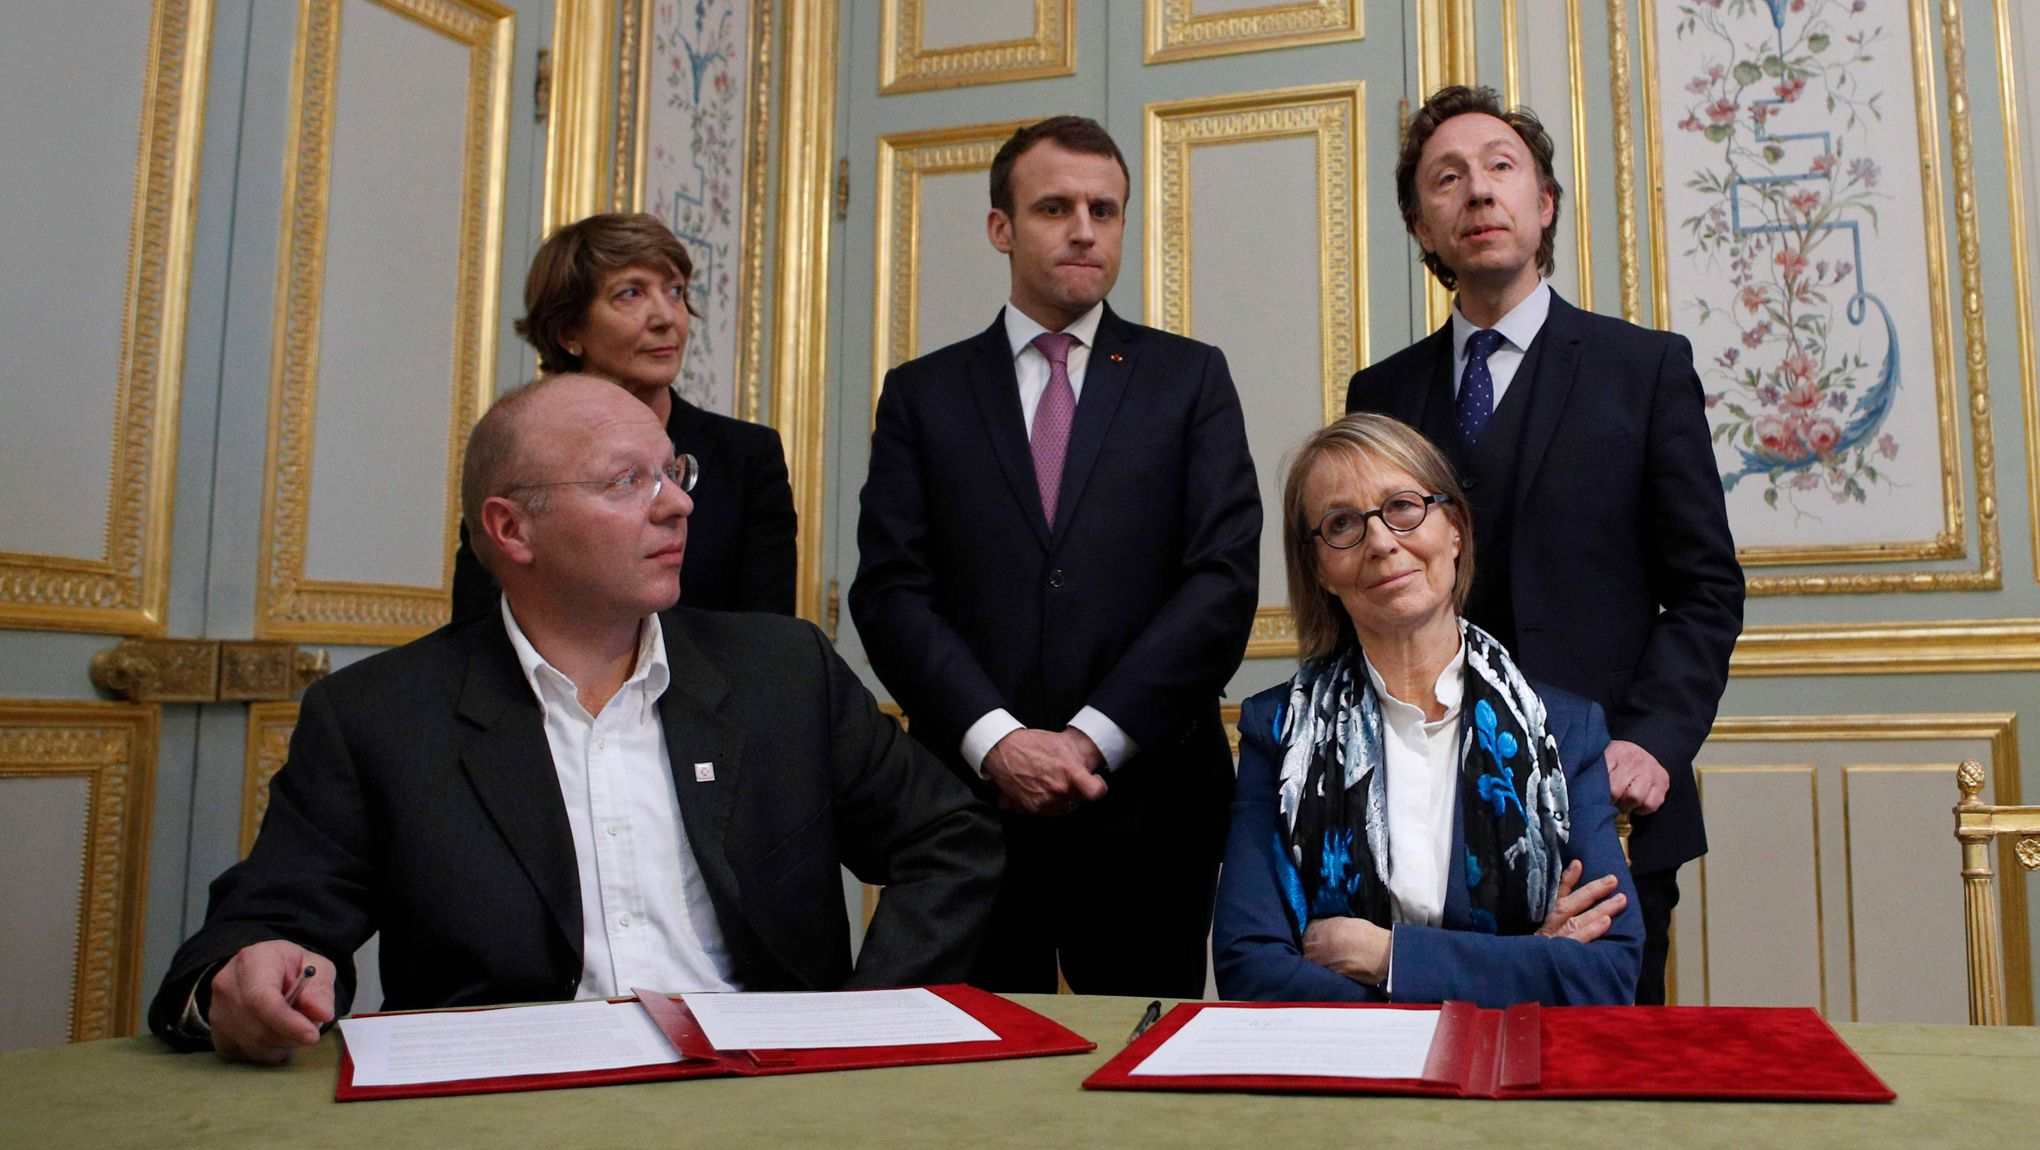 141bb8126f9b63 Patrimoine   Macron reprend la main et met Bern et Nyssen d accord